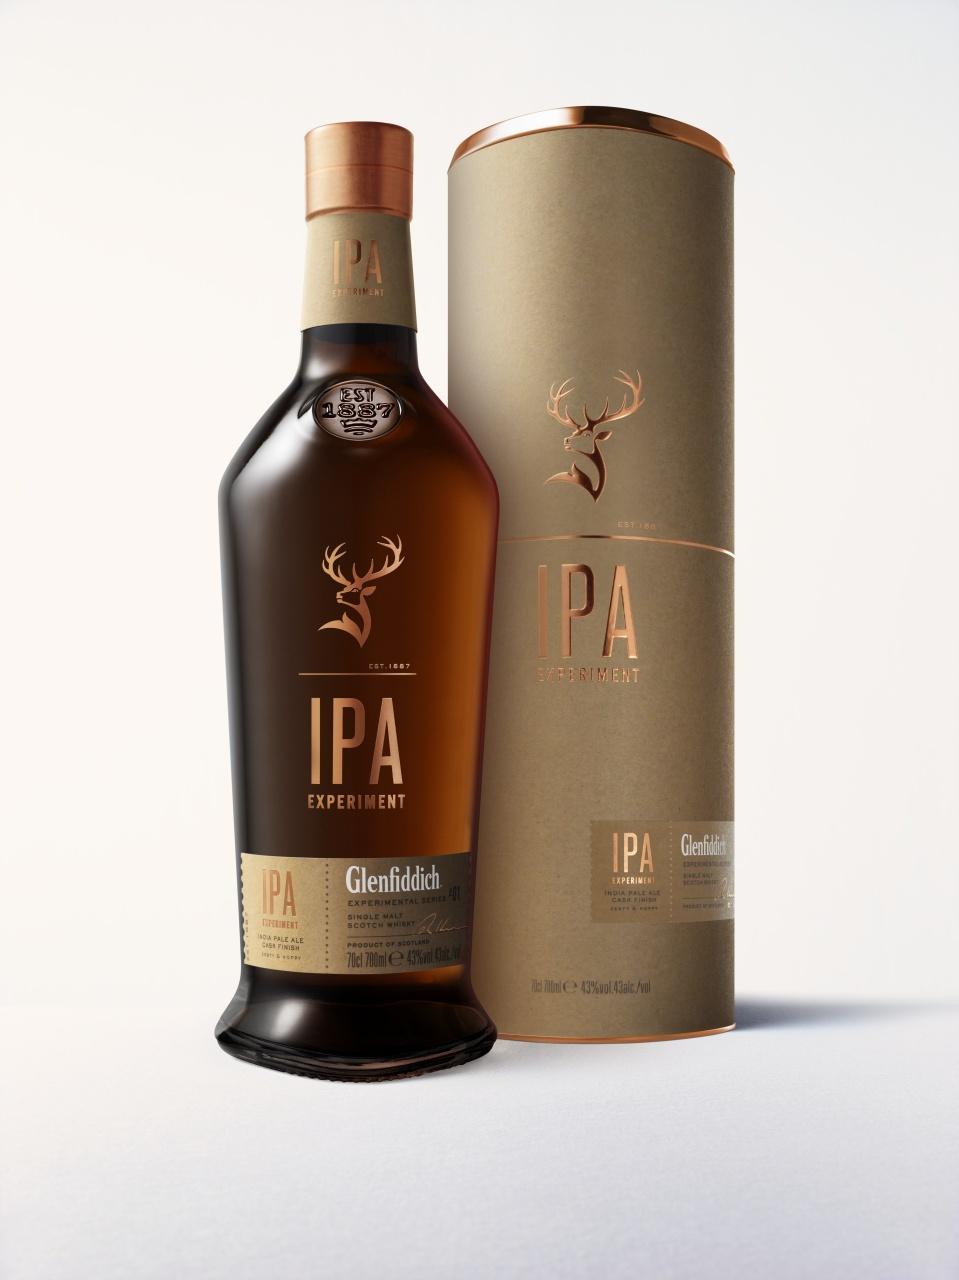 ipa-glenfiddich